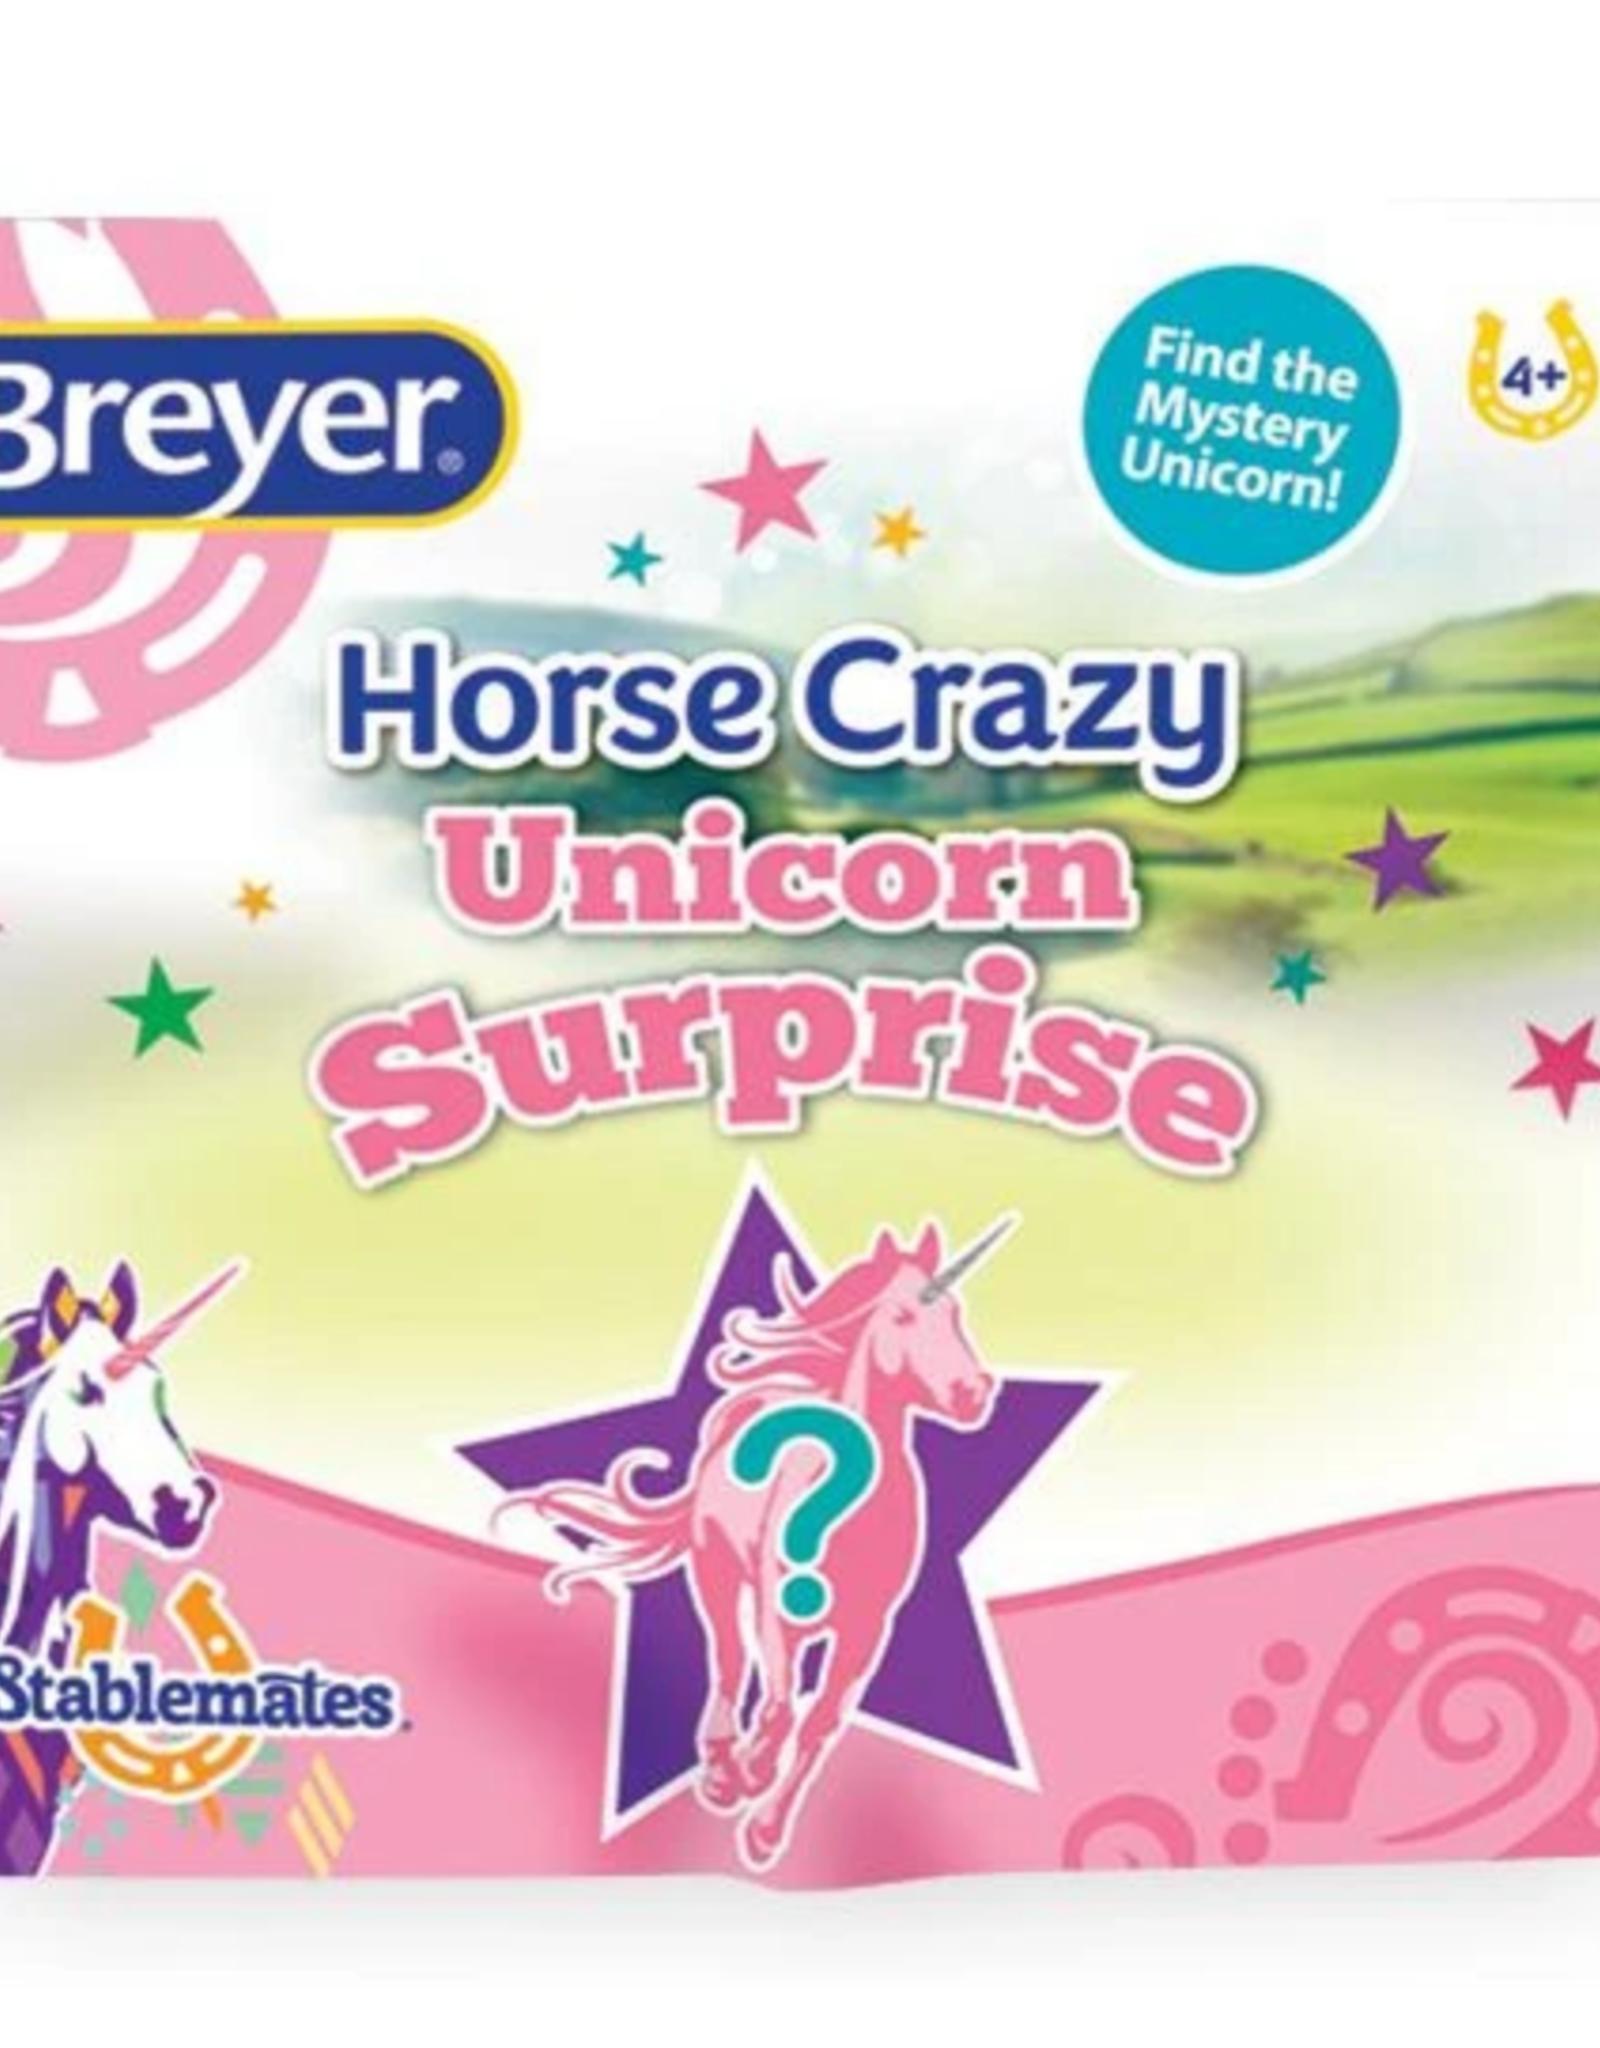 Breyer Stablemates Mystery Unicorn Surprise